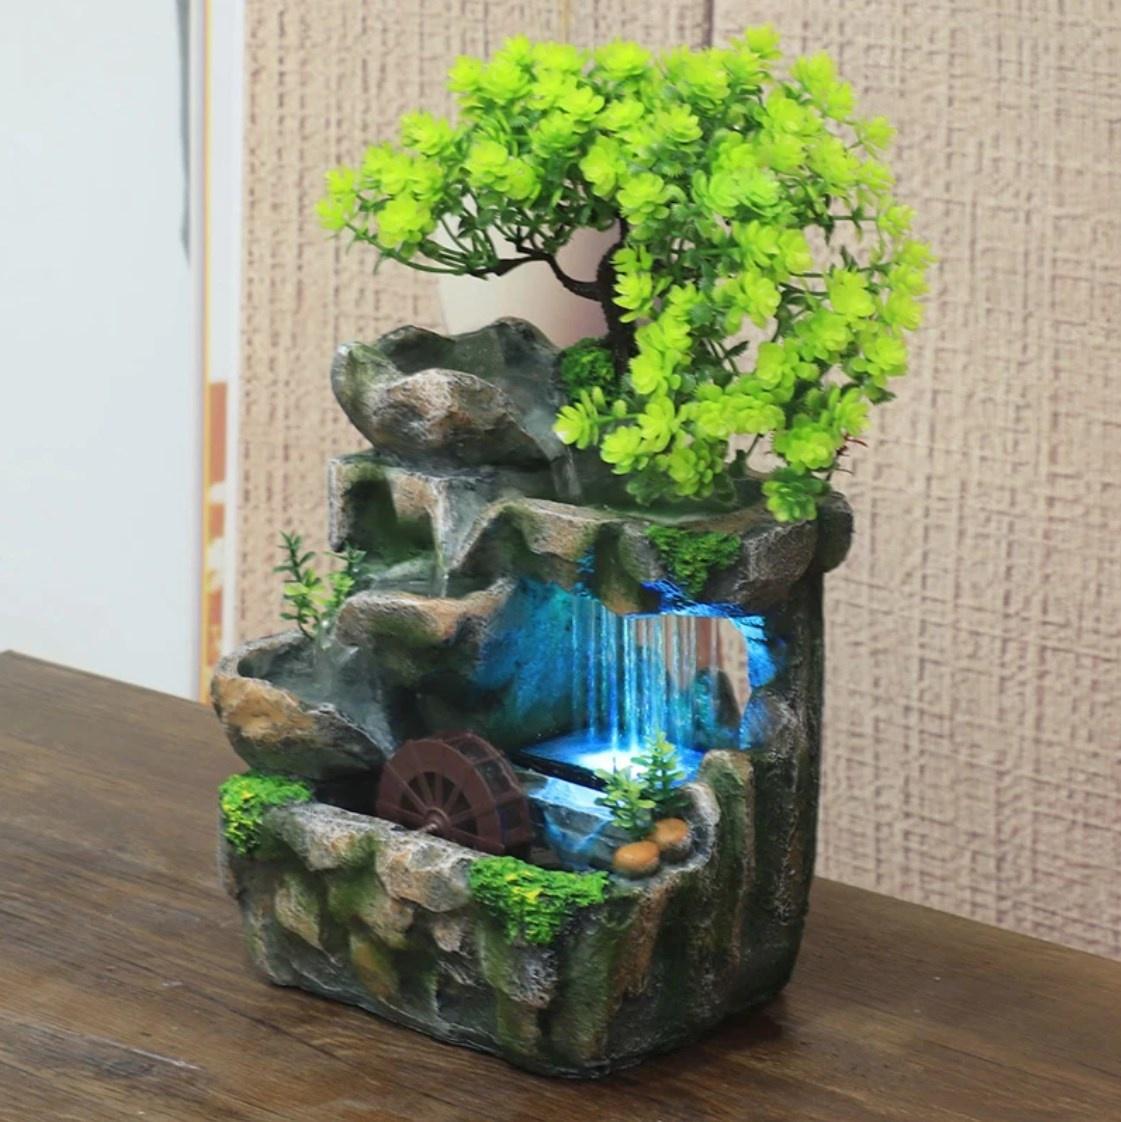 Ornamental Waterfall Zen Garden - Plant Vase Feng Shui Fountain Decor Ornament - Copy